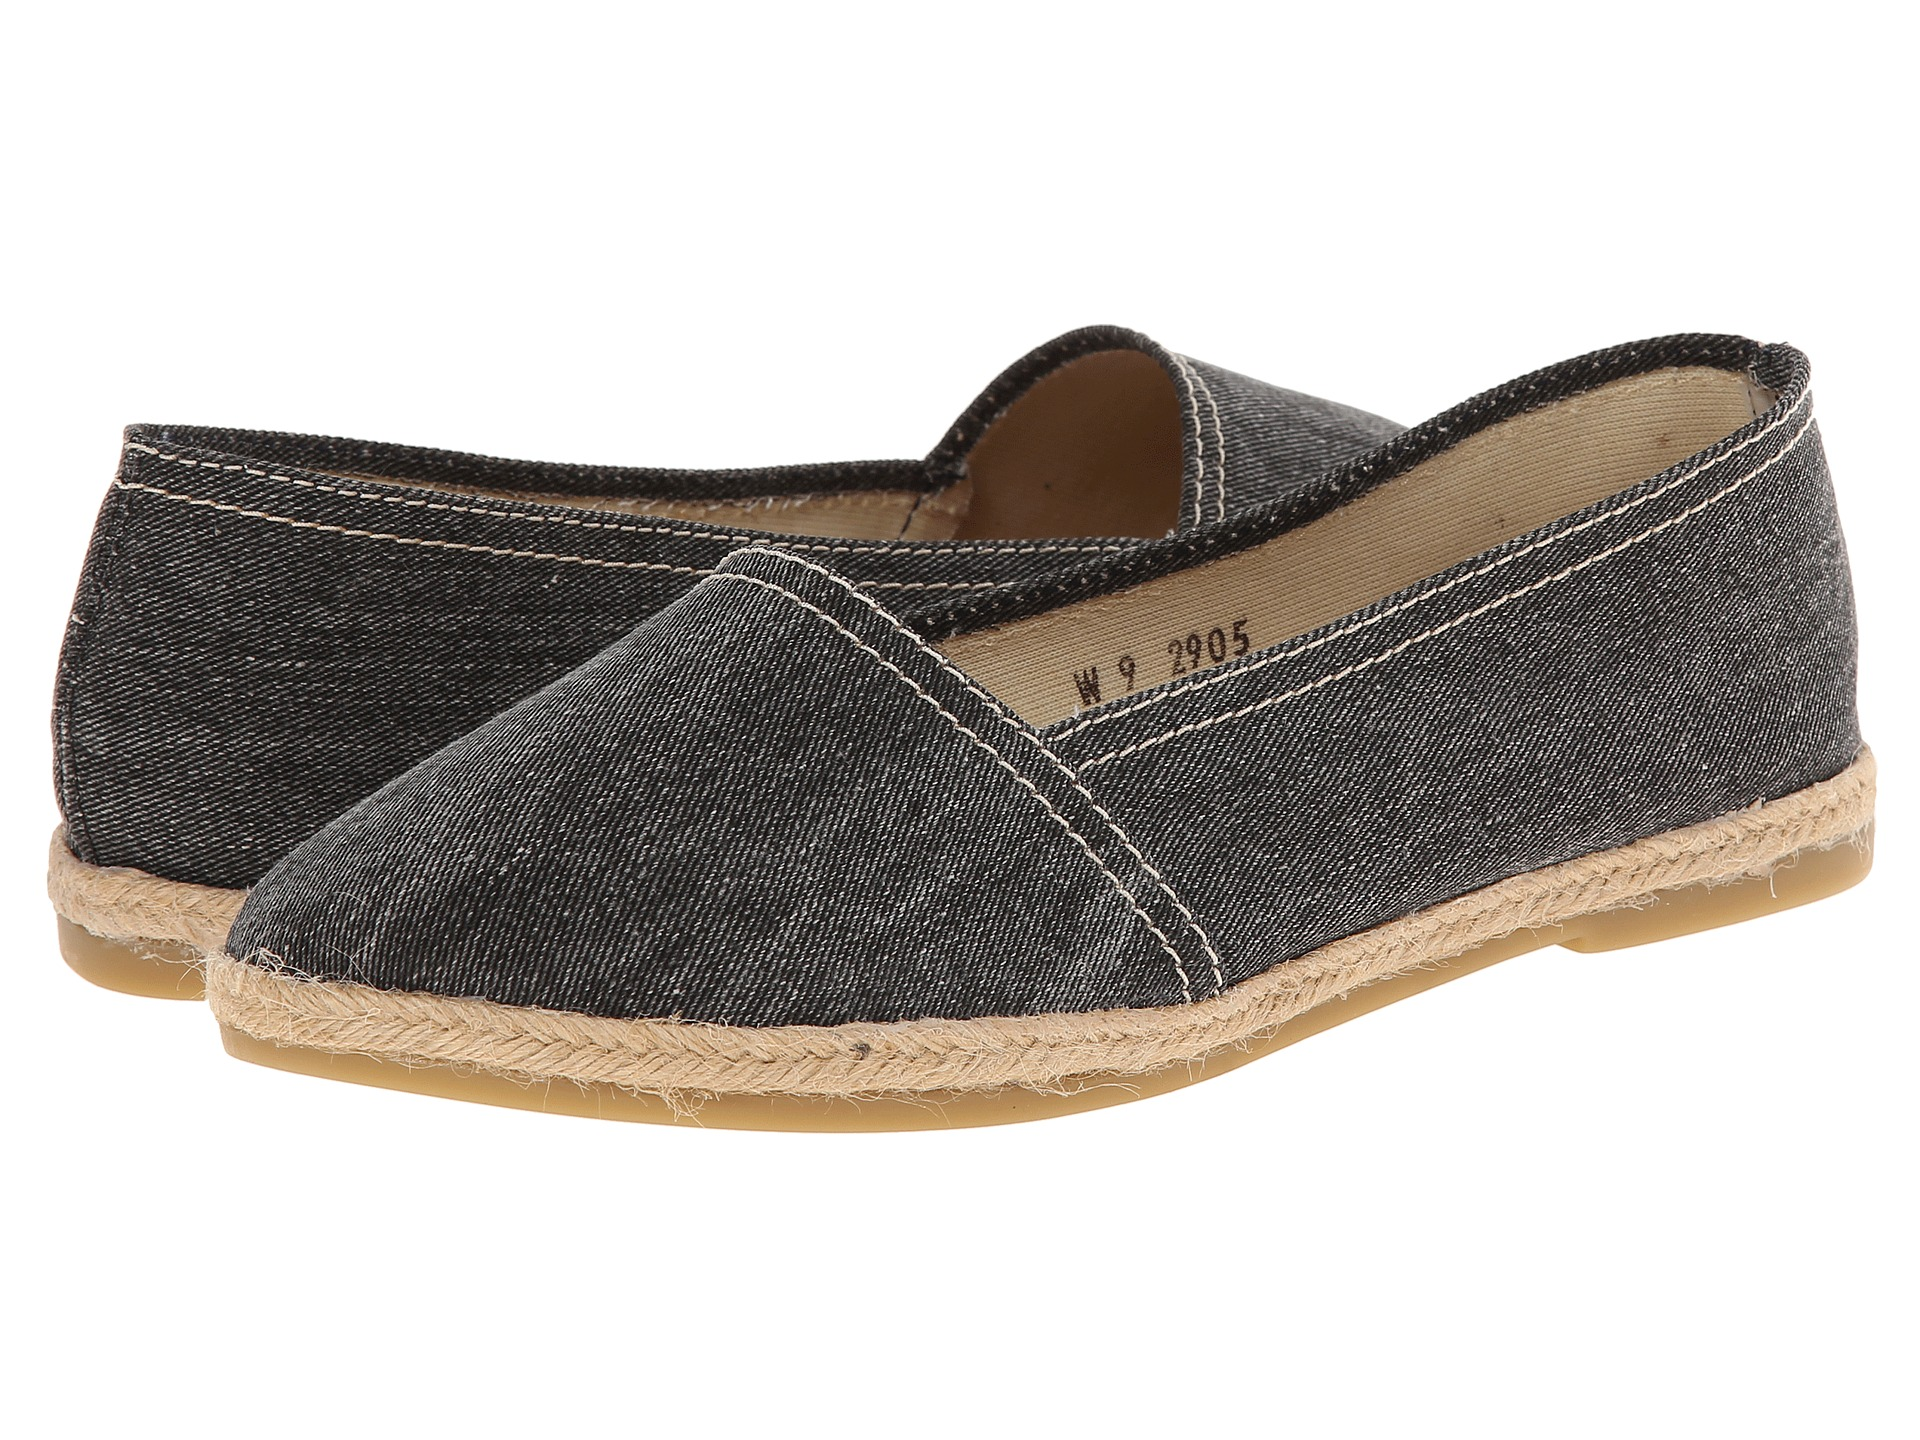 Gabriella Rocha Shoes Size Chart